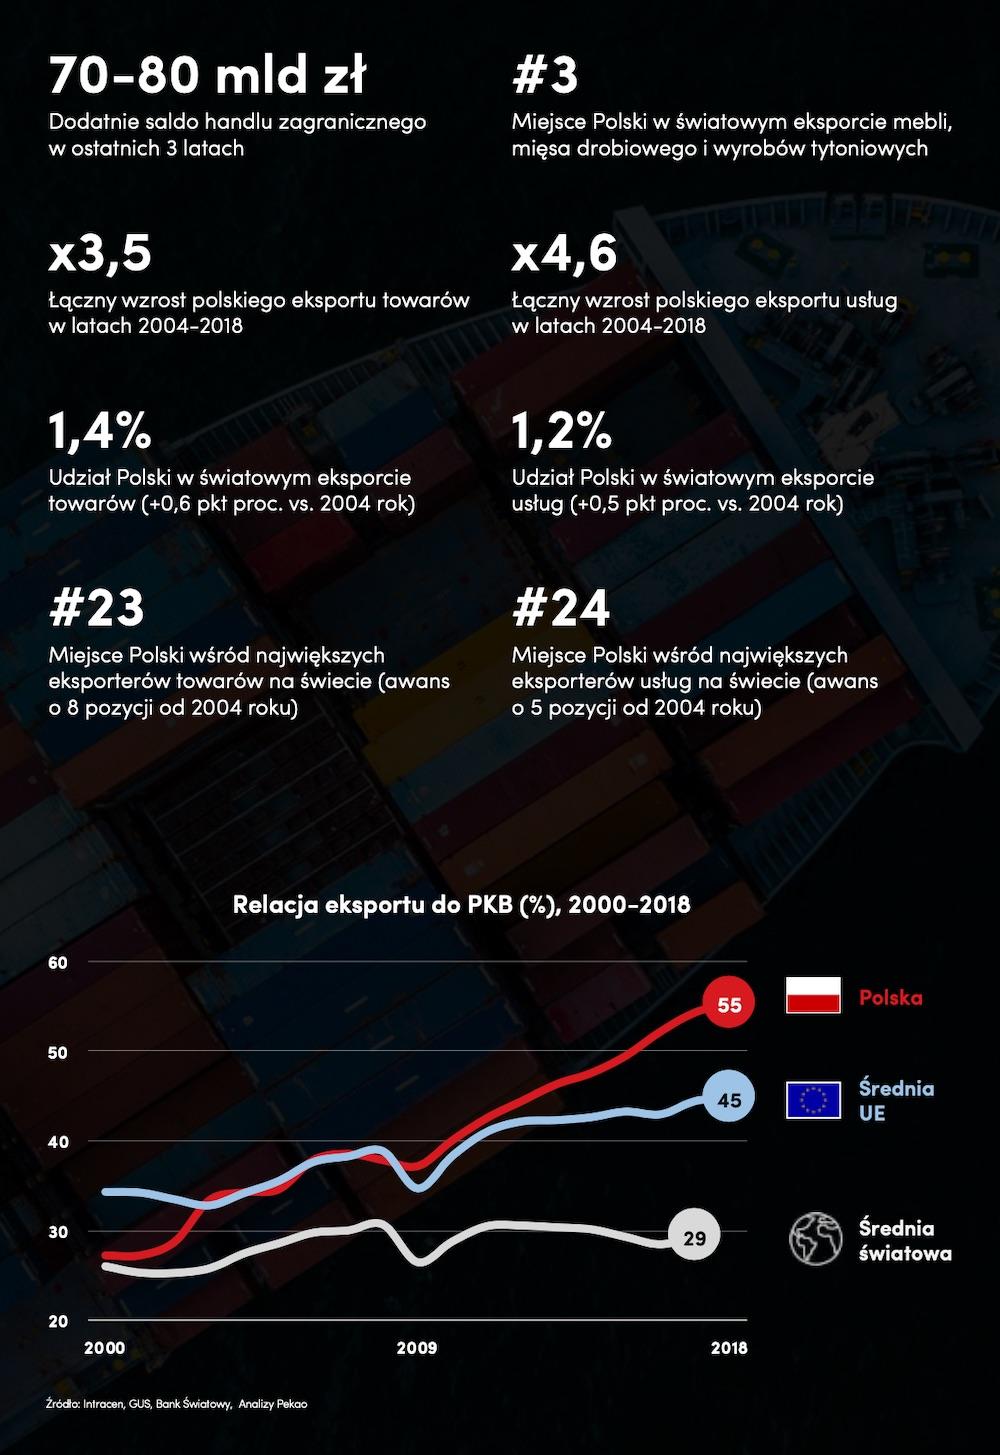 CEO Summit 2019 Pekao Raport